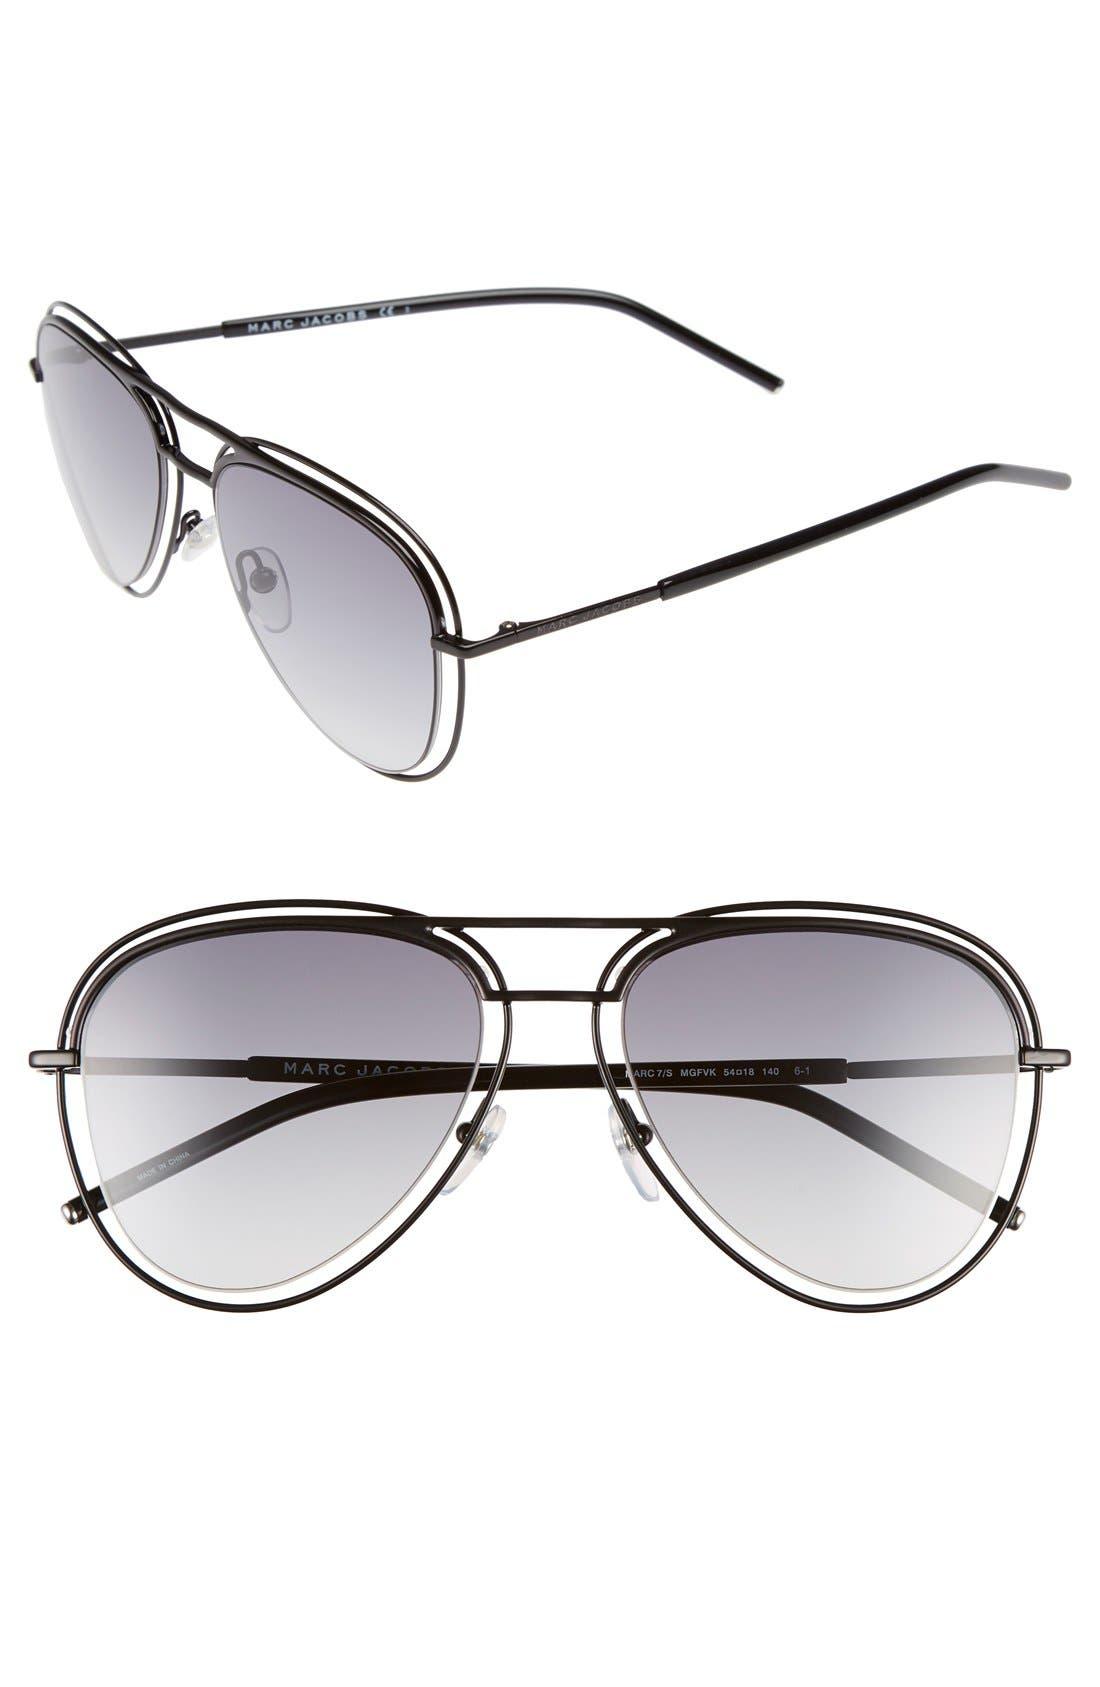 MARC JACOBS 54mm Aviator Sunglasses